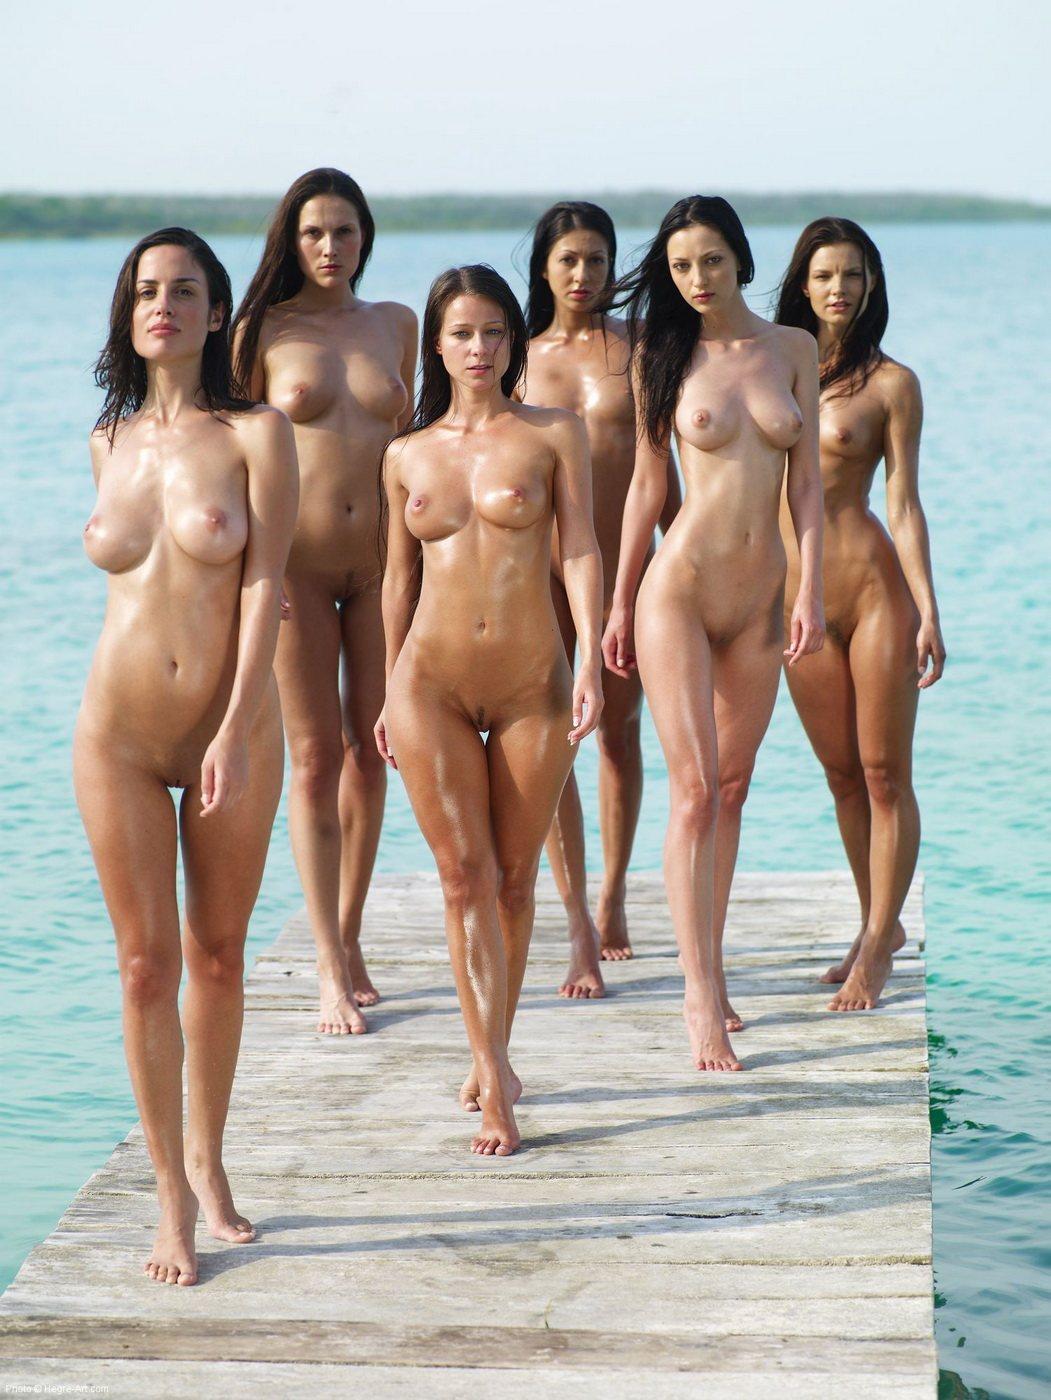 Topless Beach Girl